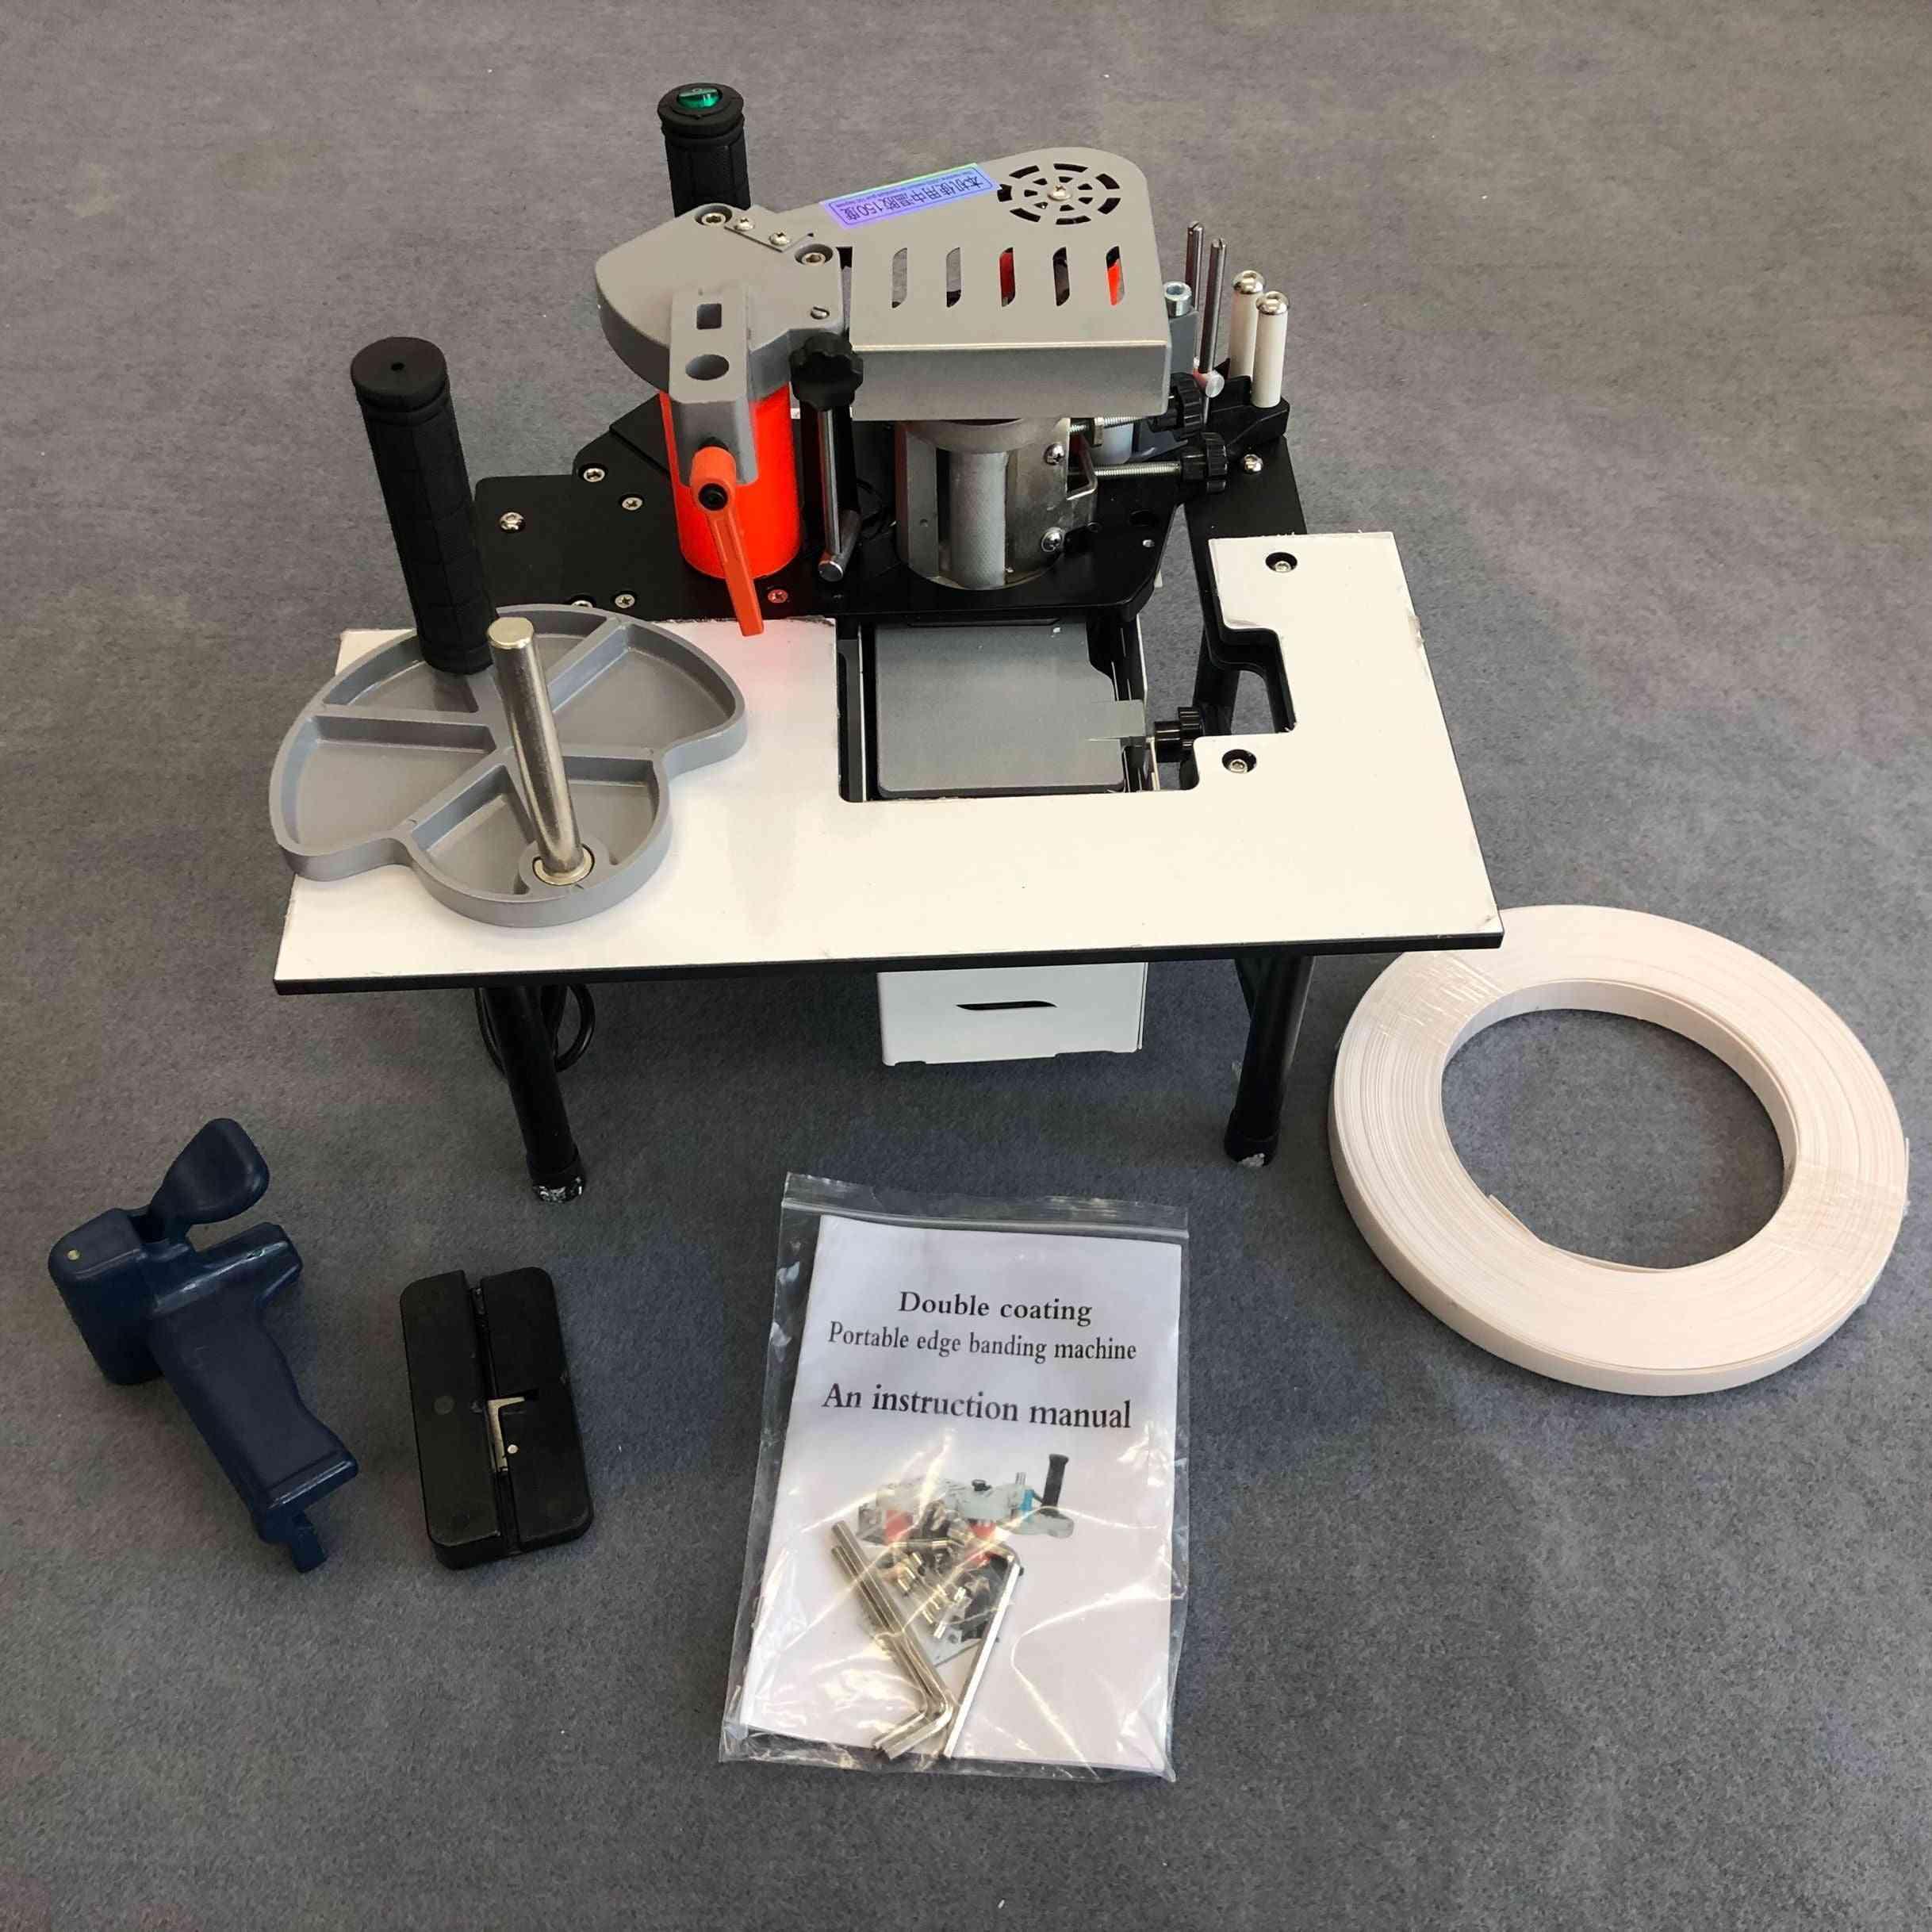 Double Side Gluing Portable Edge Bander Woodworking Edge Banding Machine